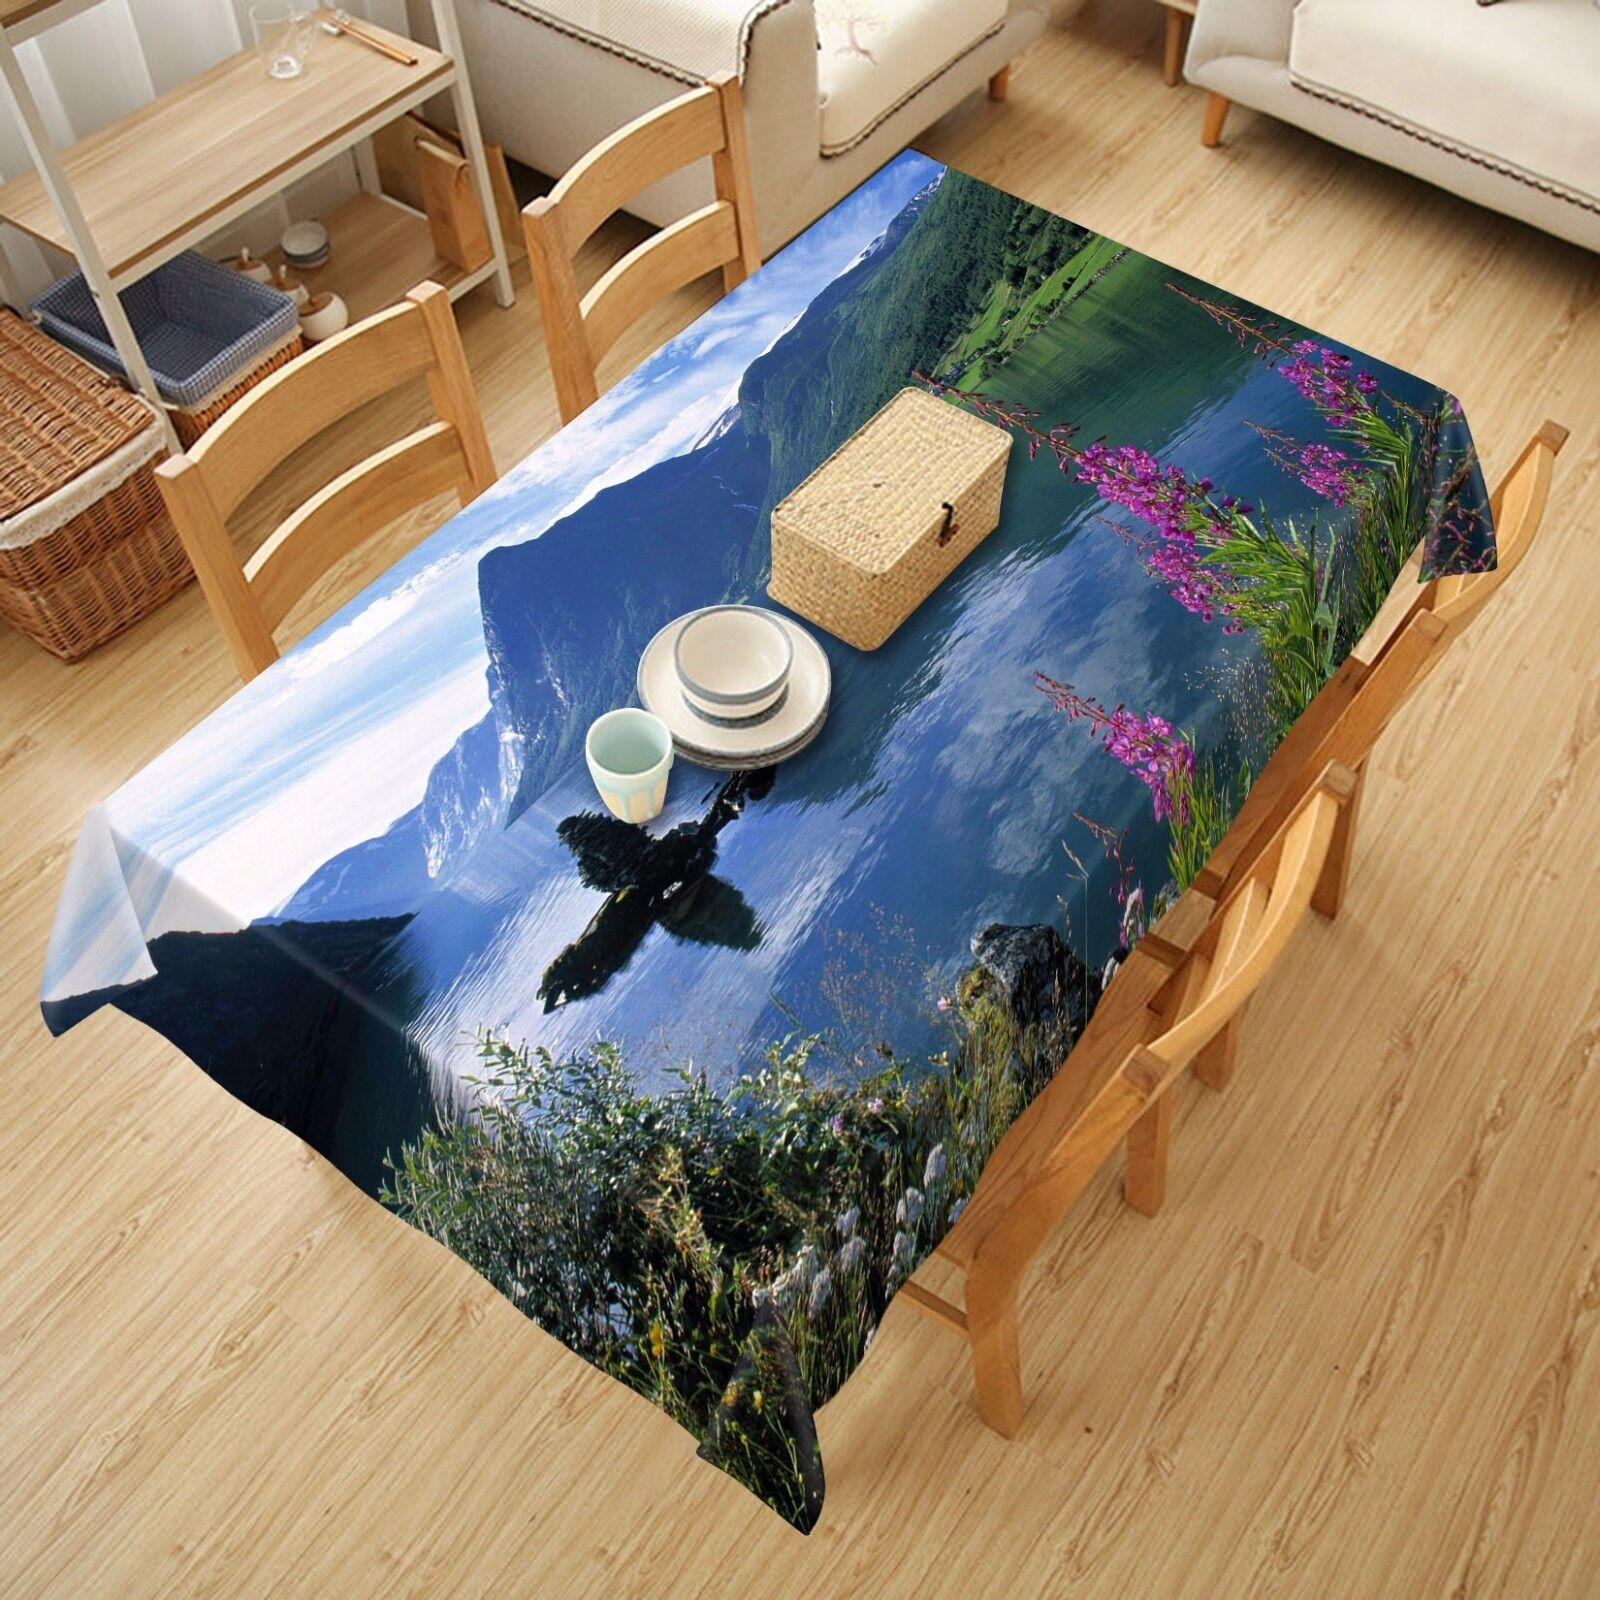 3D River 59 Tablecloth Table Cover Cloth Birthday Party AJ WALLPAPER UK Lemon